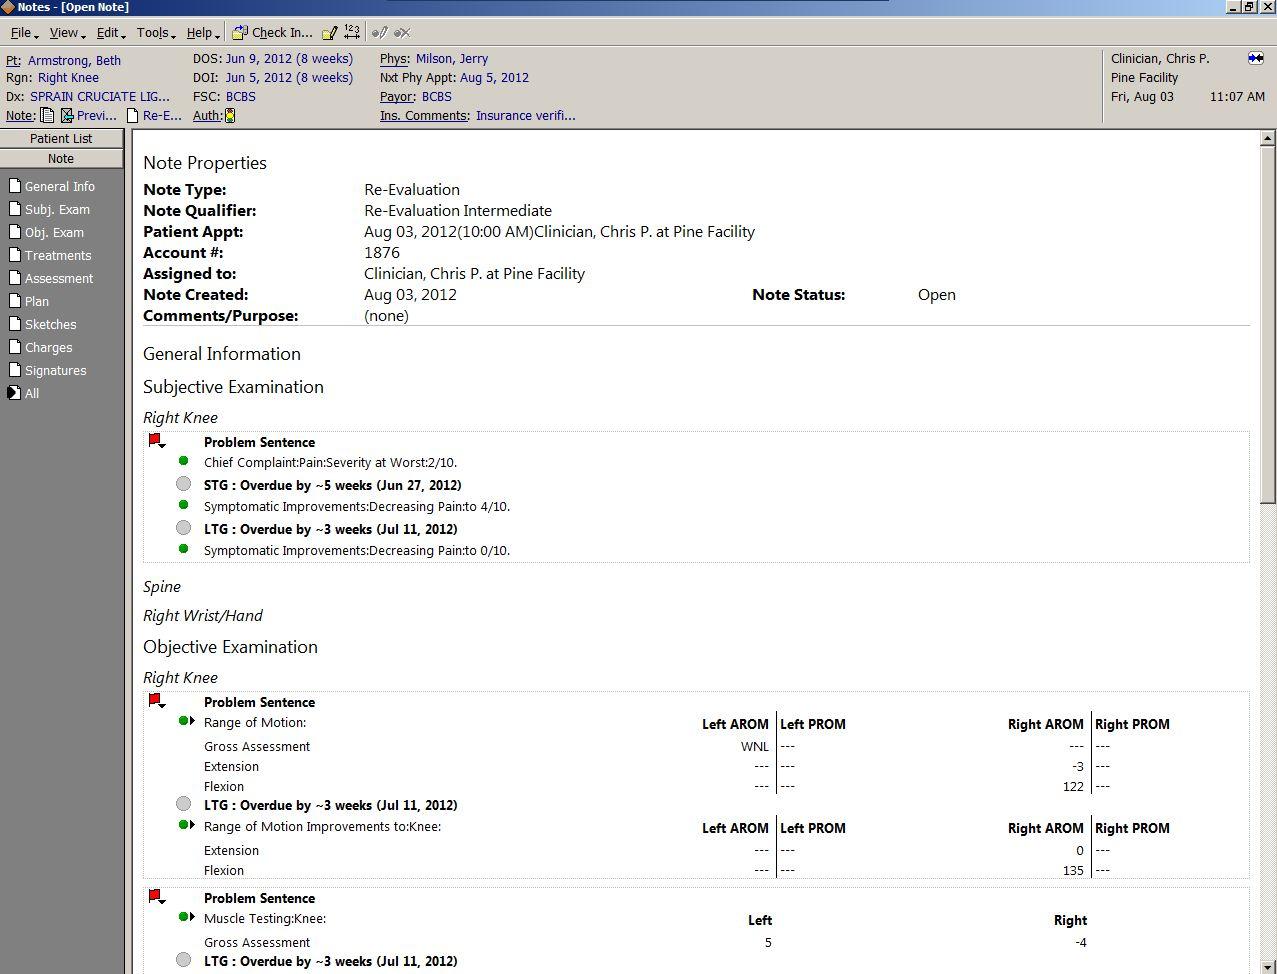 Patient document view screen